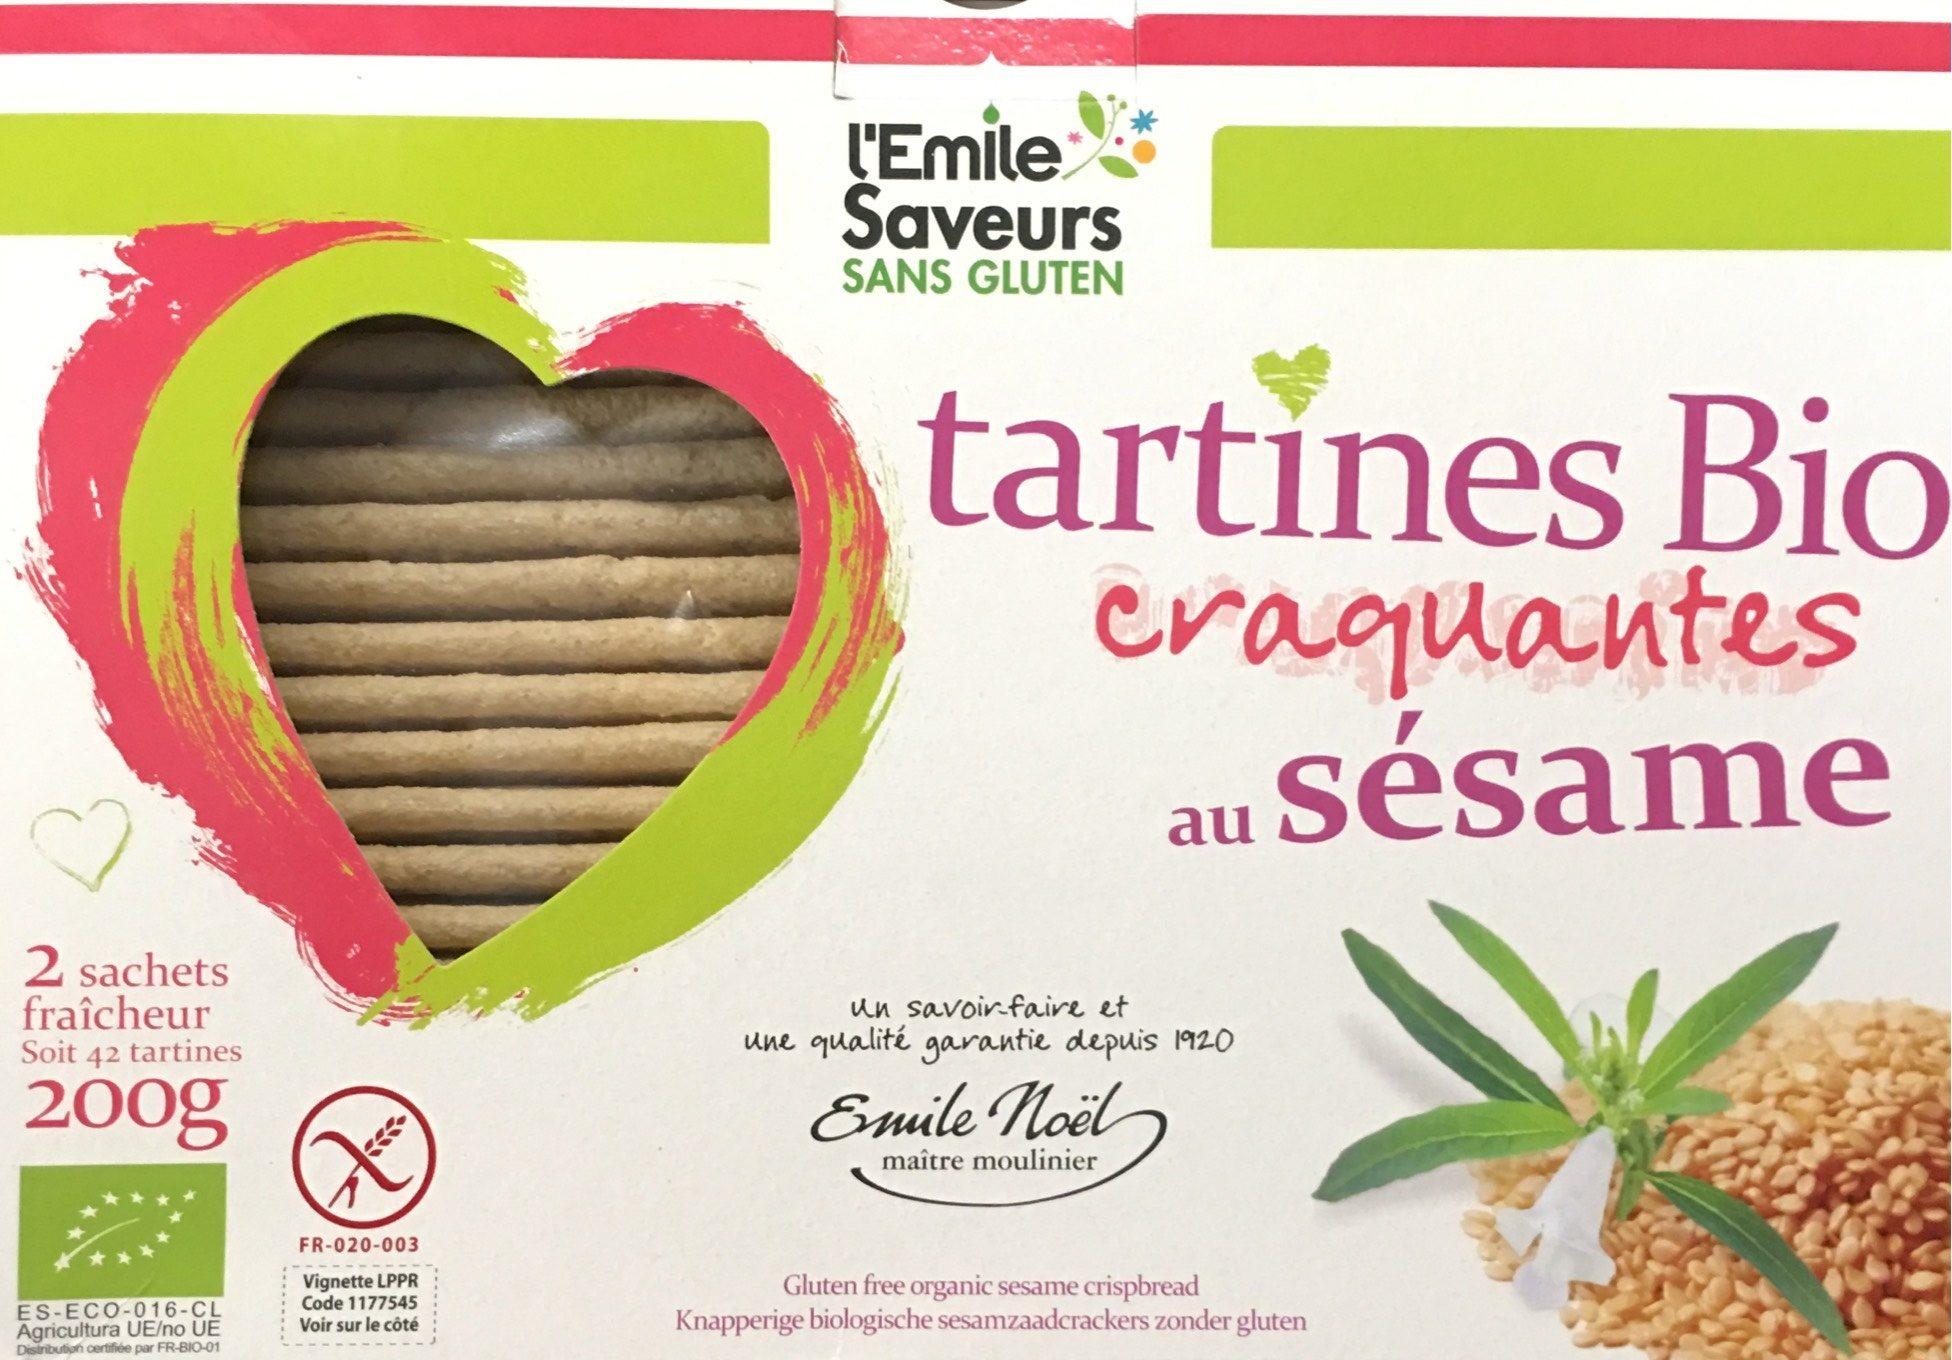 Tartines Bio Craquantes au Sésame - Product